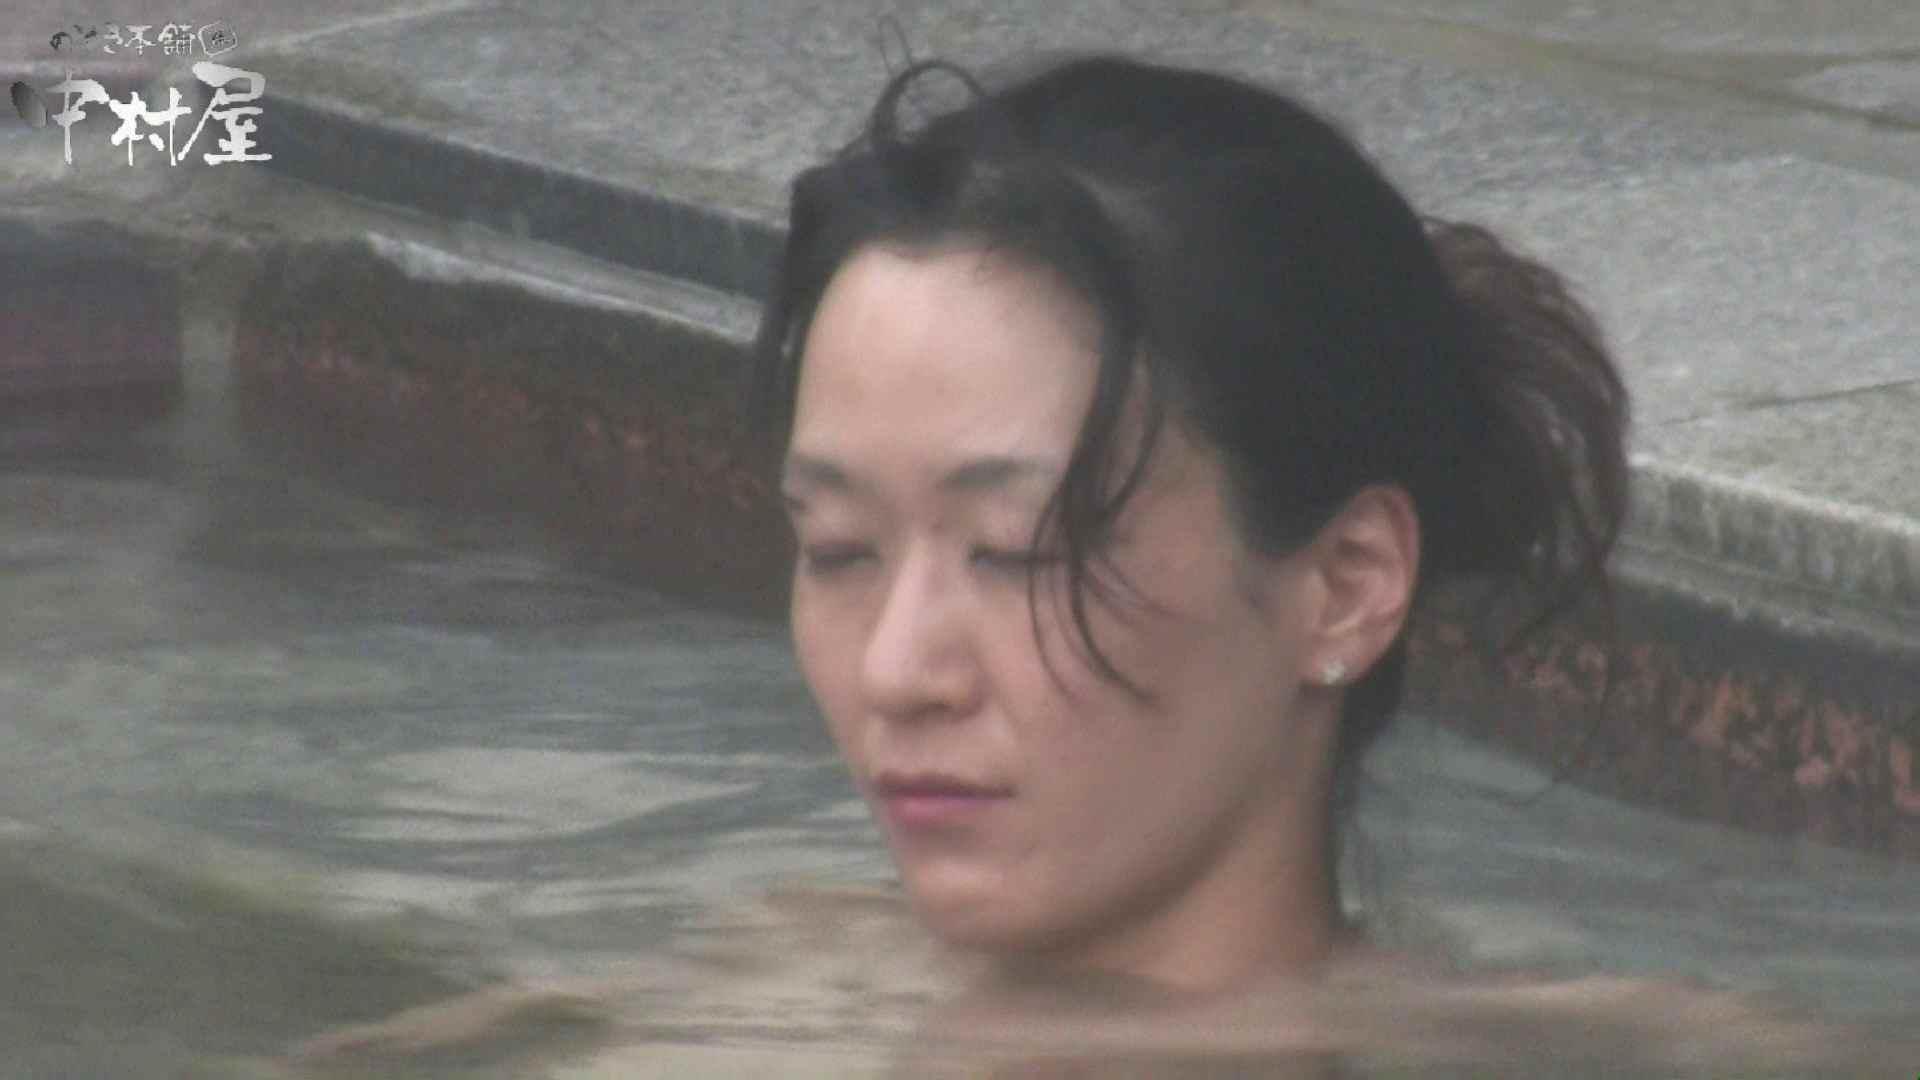 Aquaな露天風呂Vol.928 OLセックス | 盗撮  99画像 73